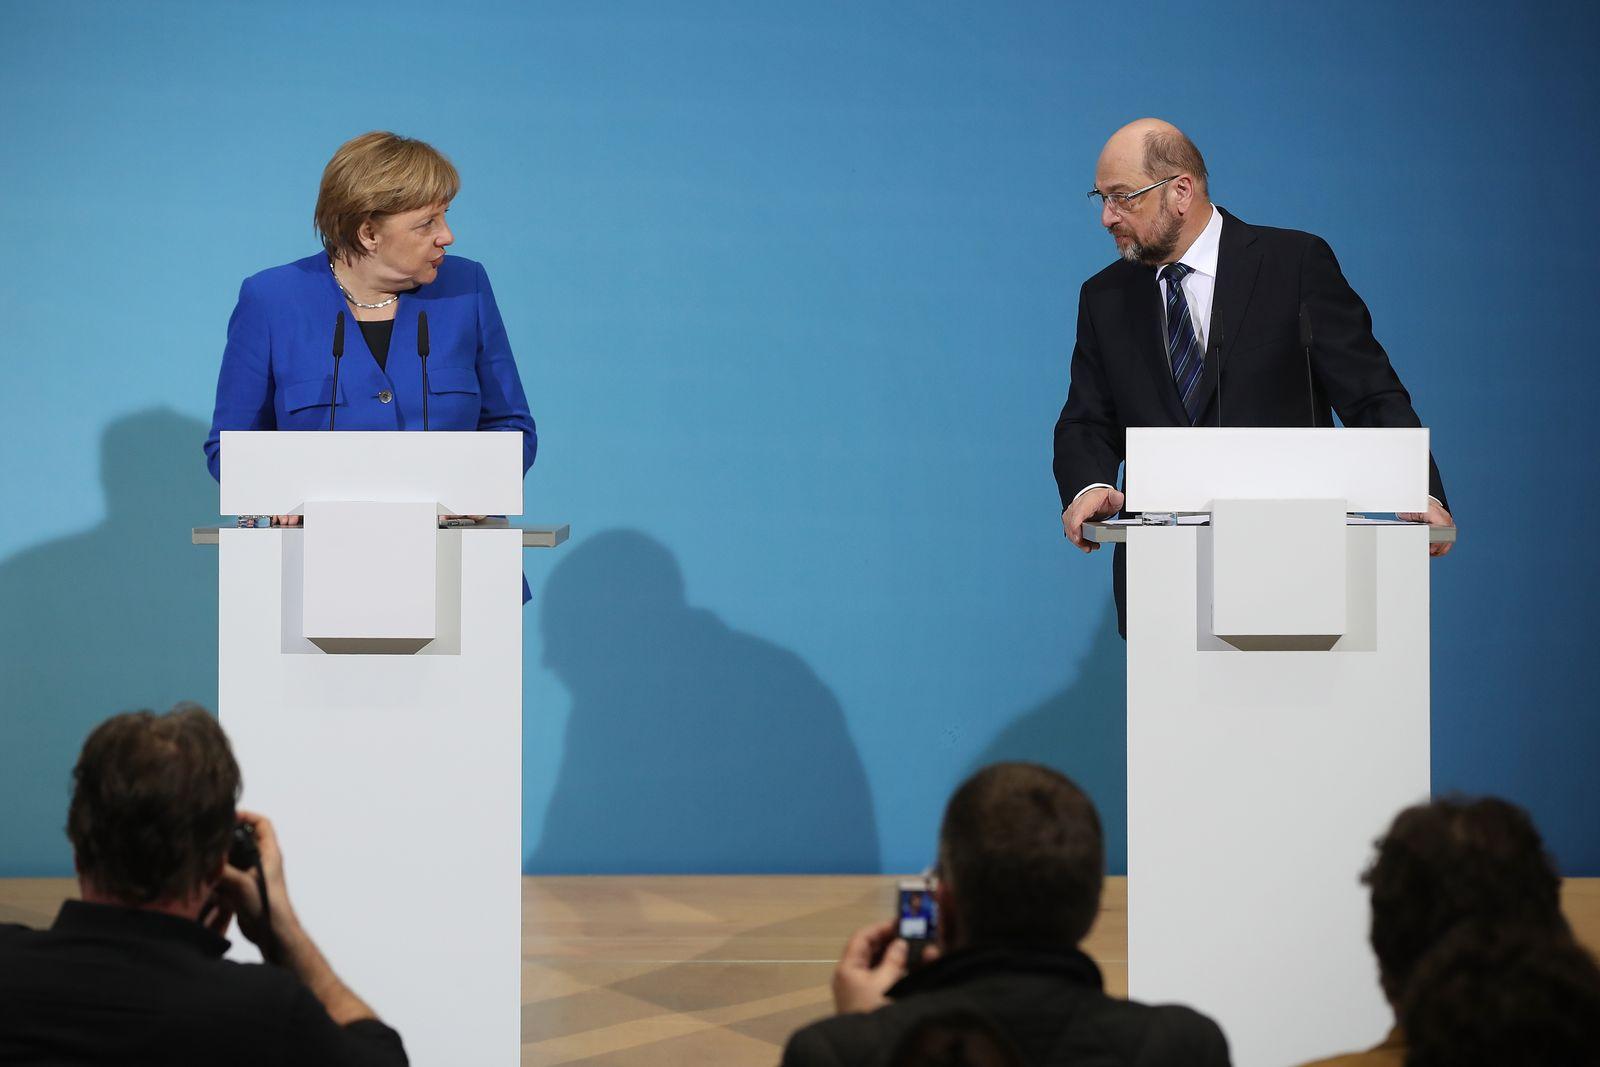 Koalition/ GroKo/ Seehofer/ Merkel/ Schulz